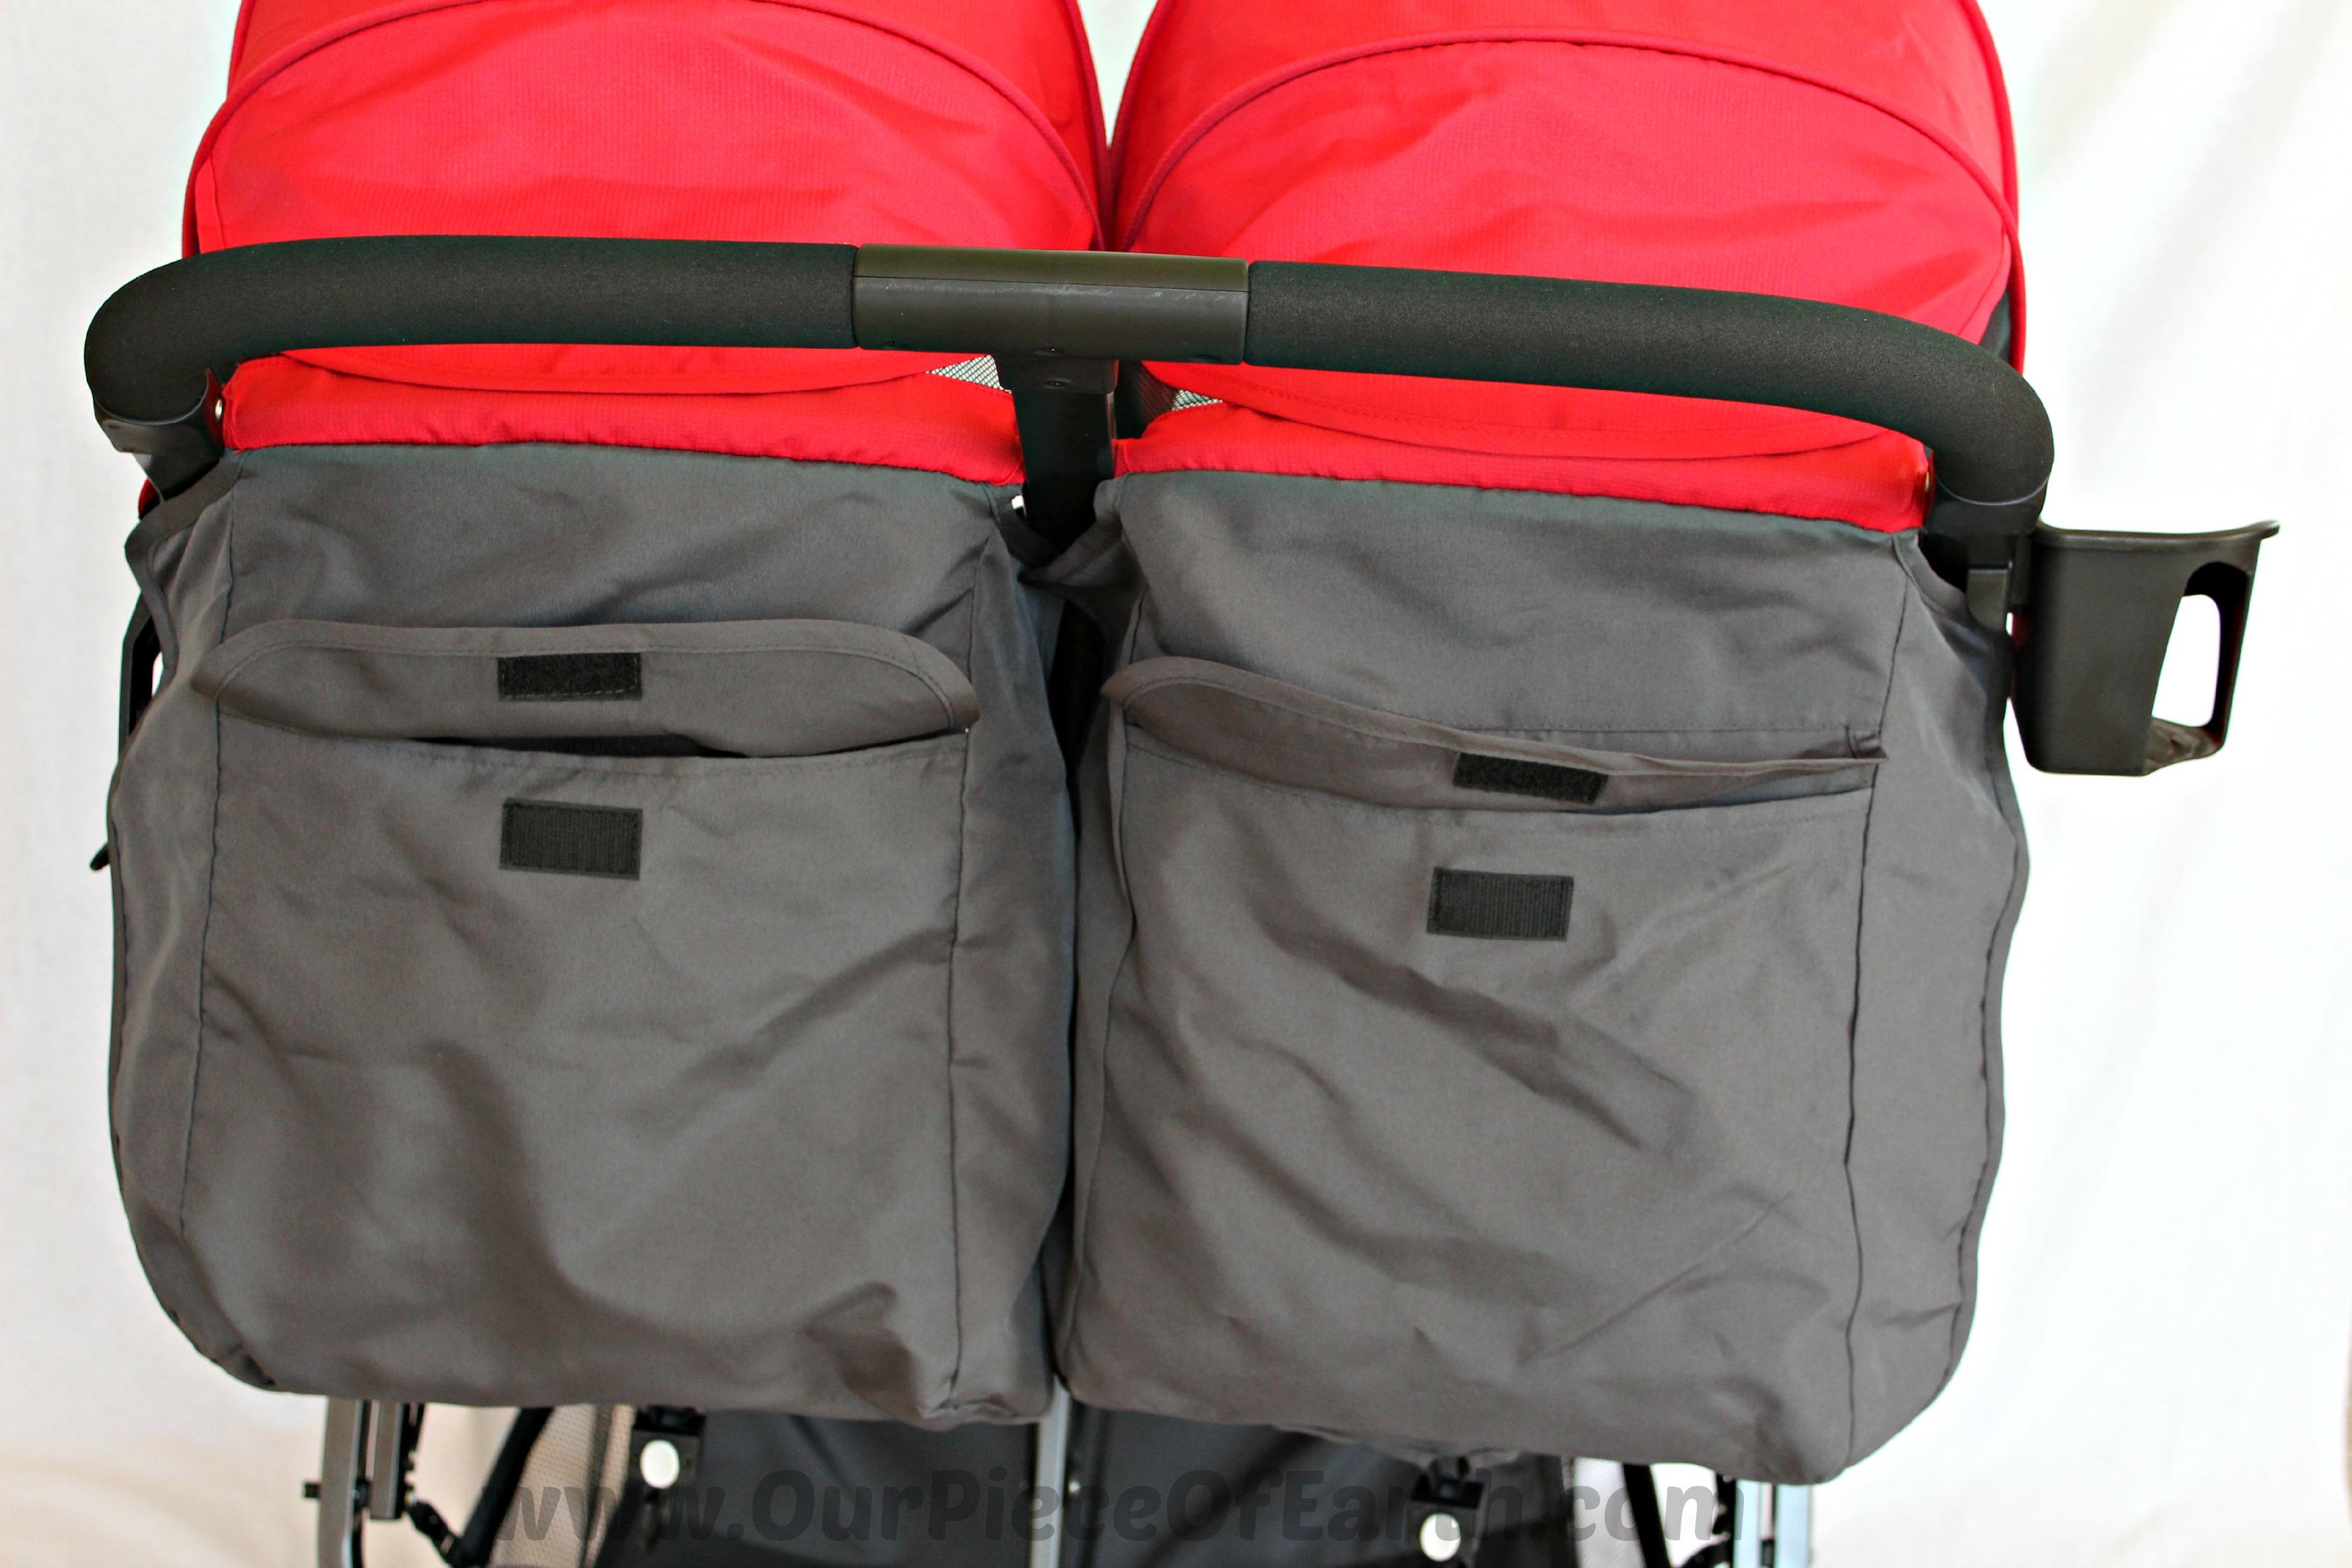 Combi back pockets